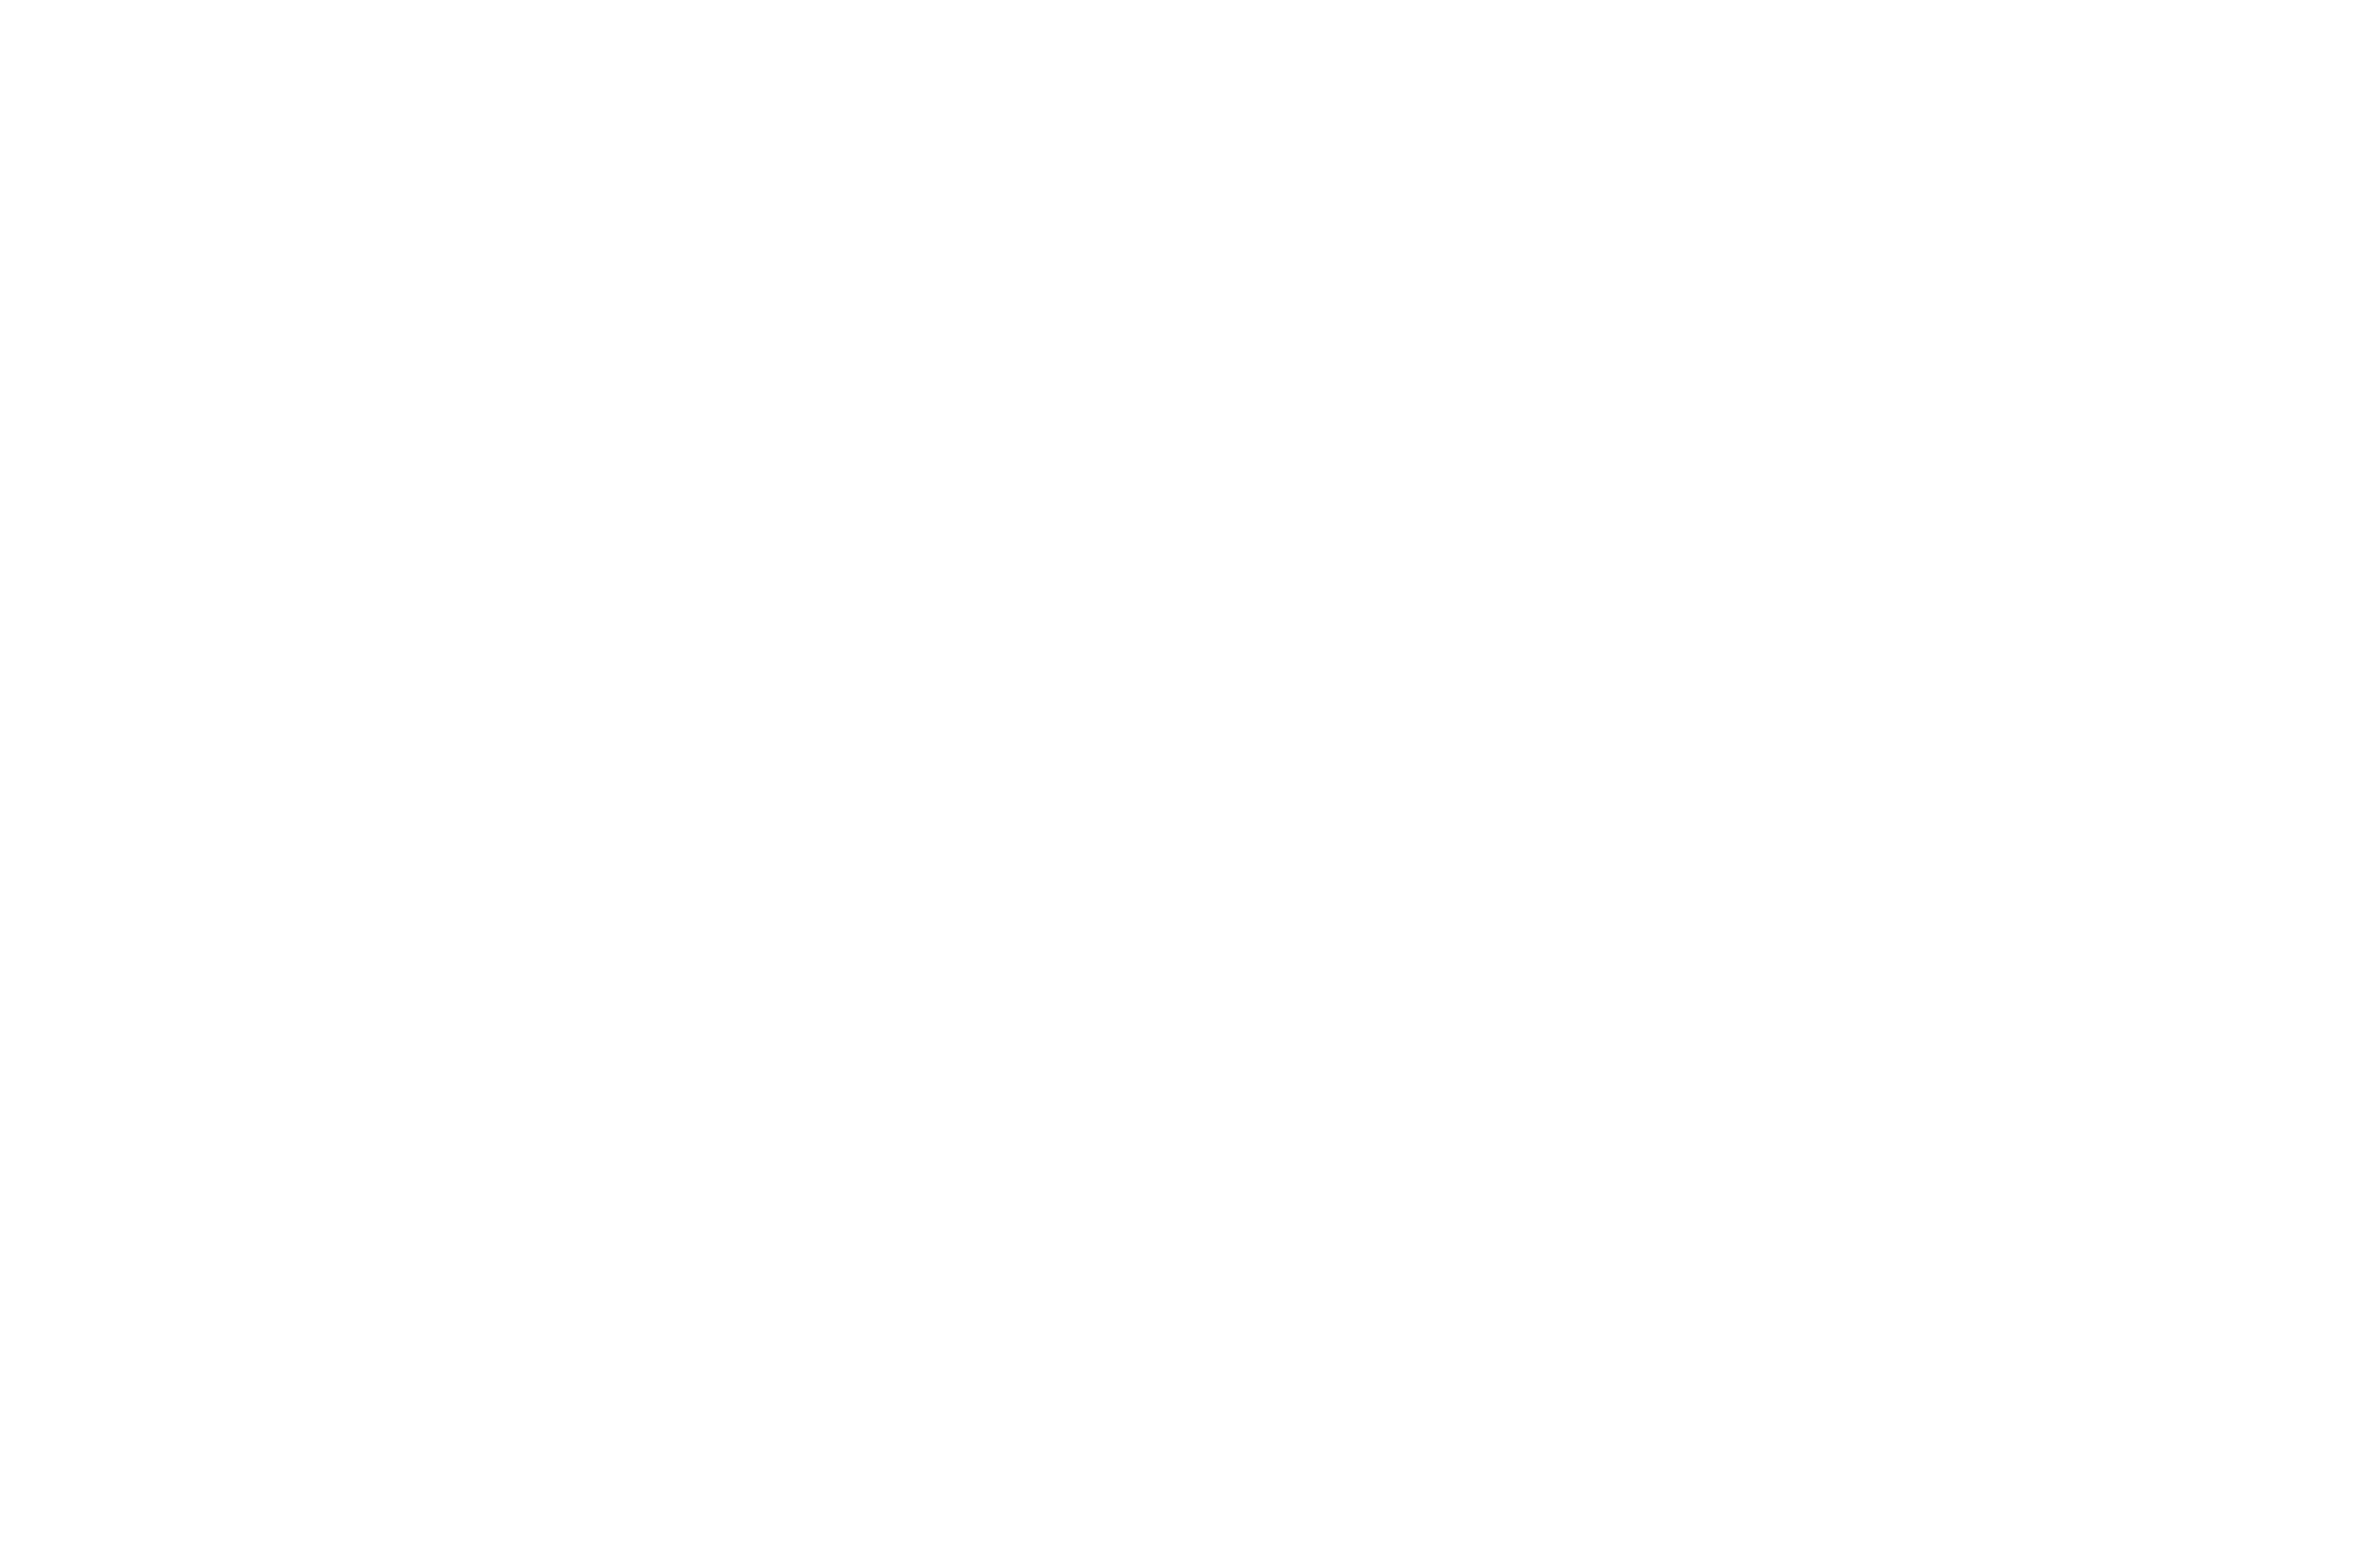 ECFR Annual Council Meeting logo